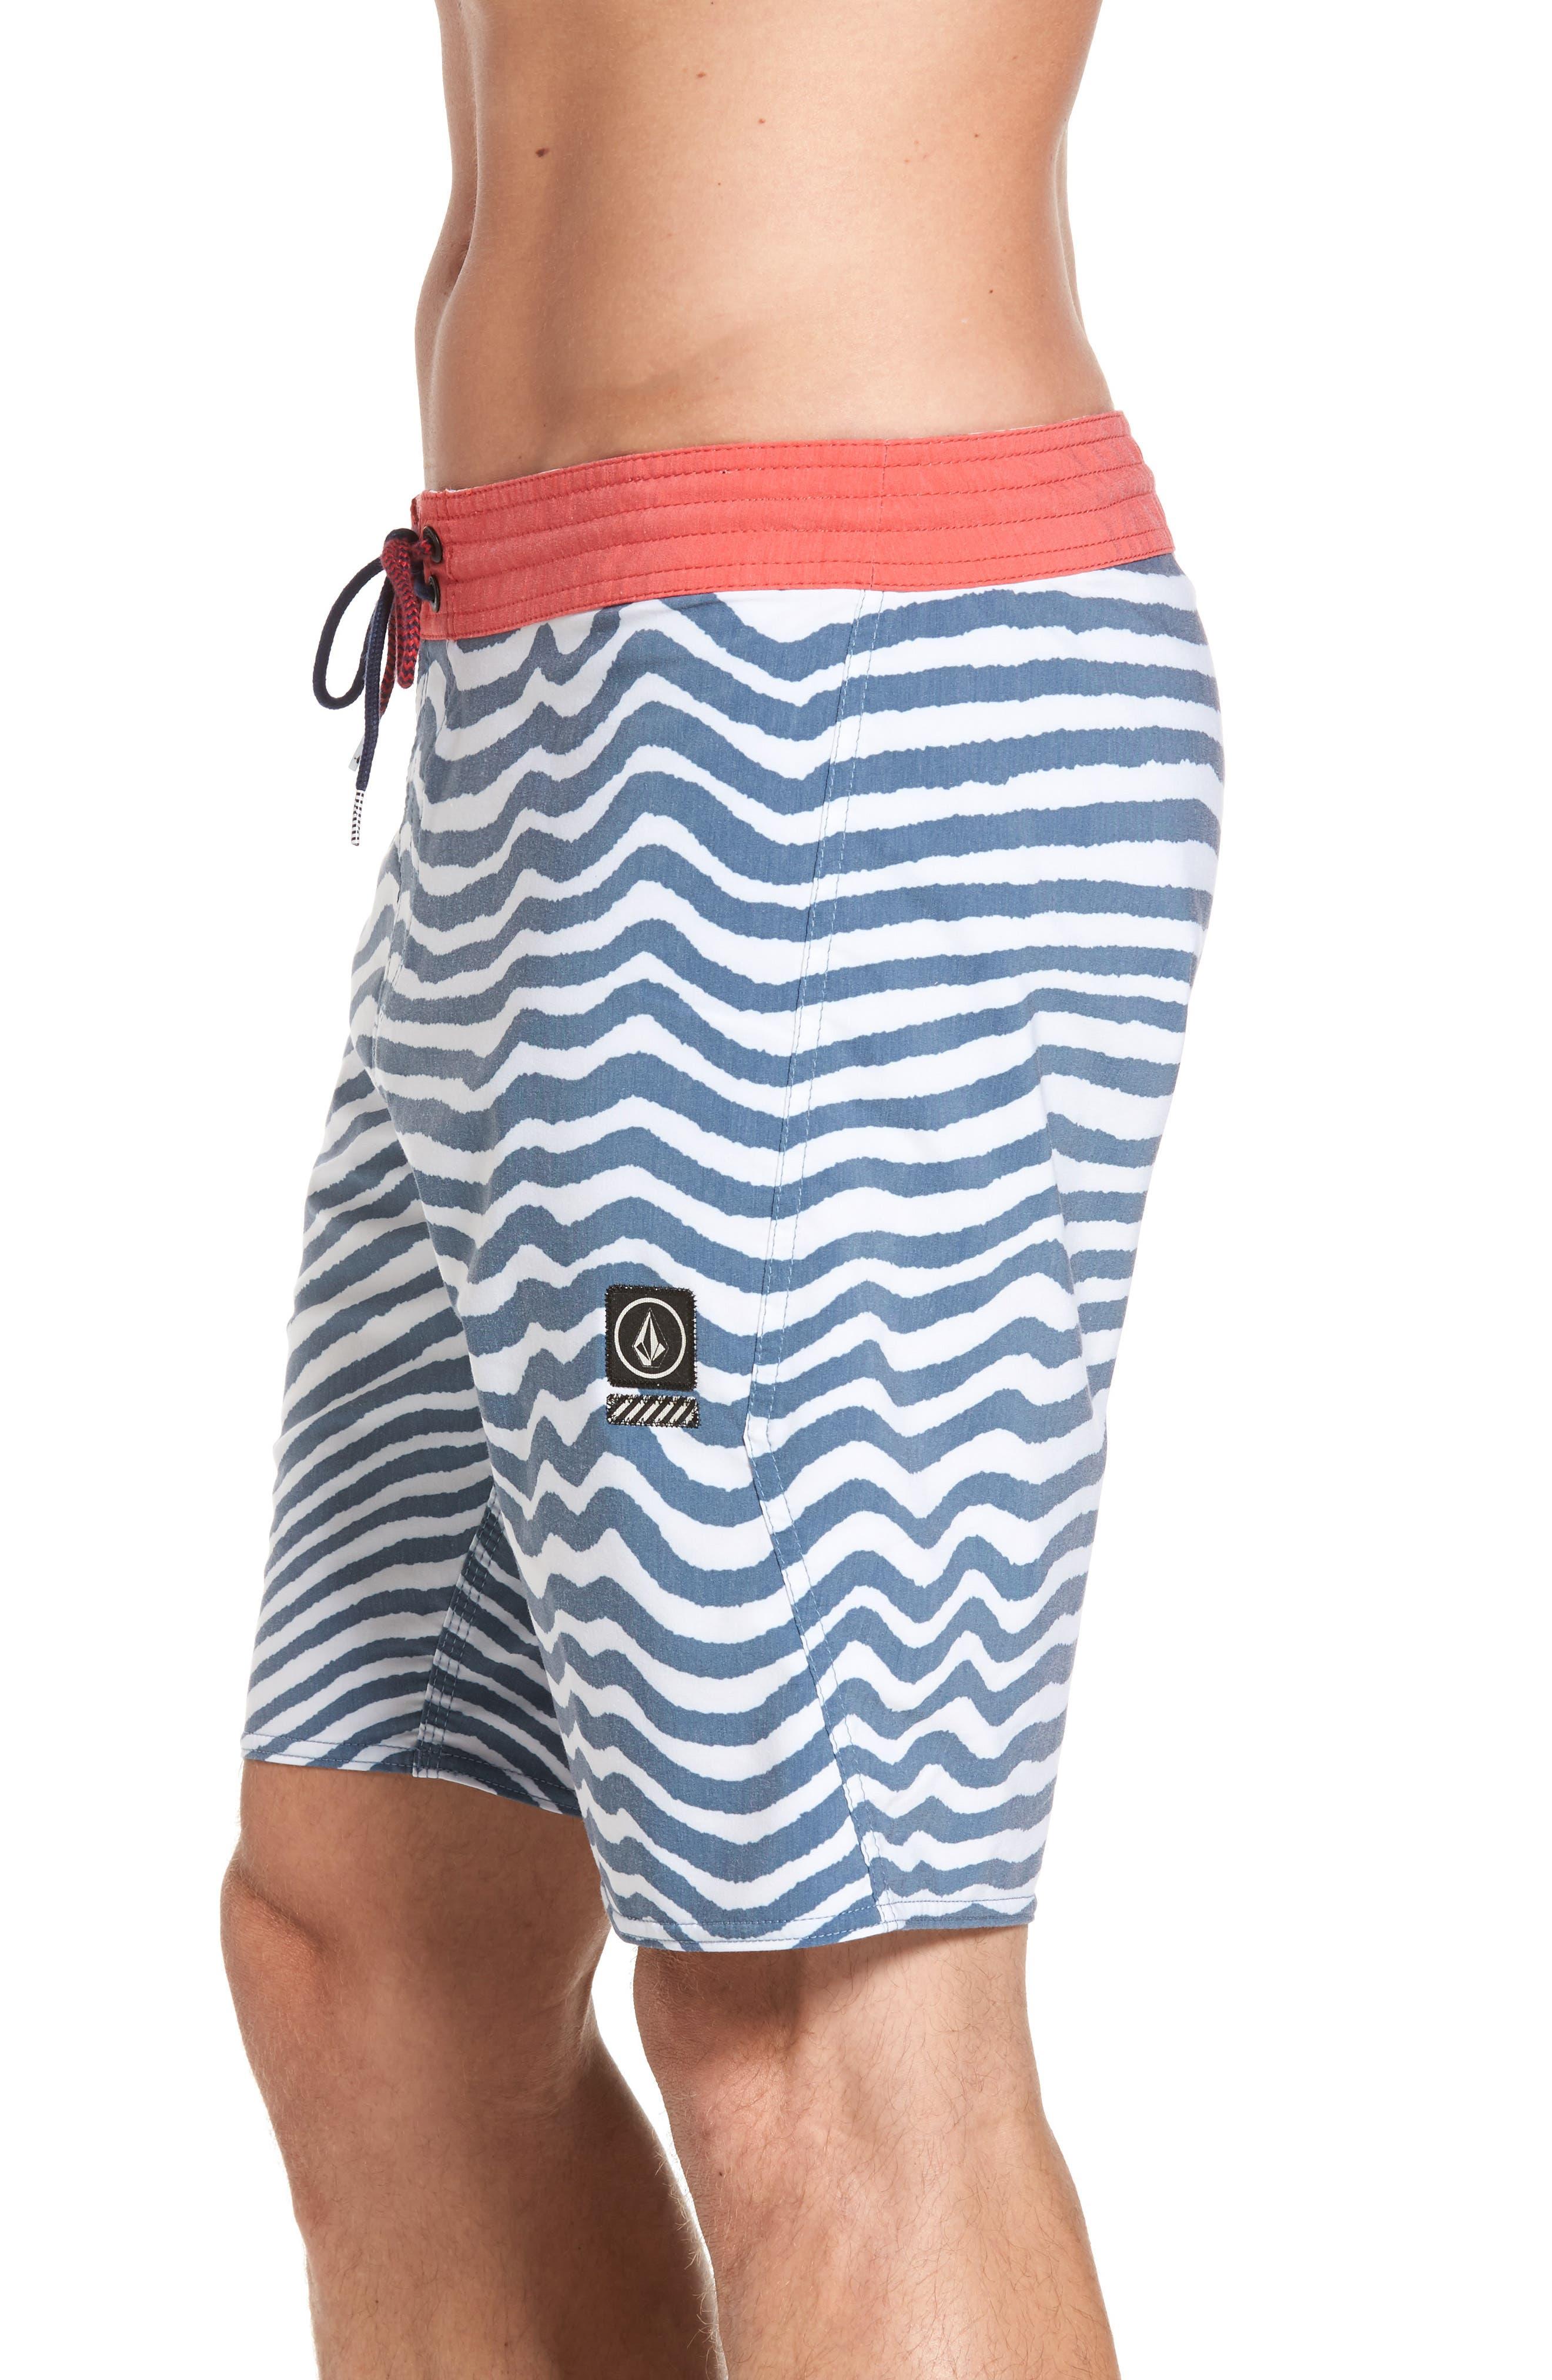 Stripey Slinger Board Shorts,                             Alternate thumbnail 21, color,